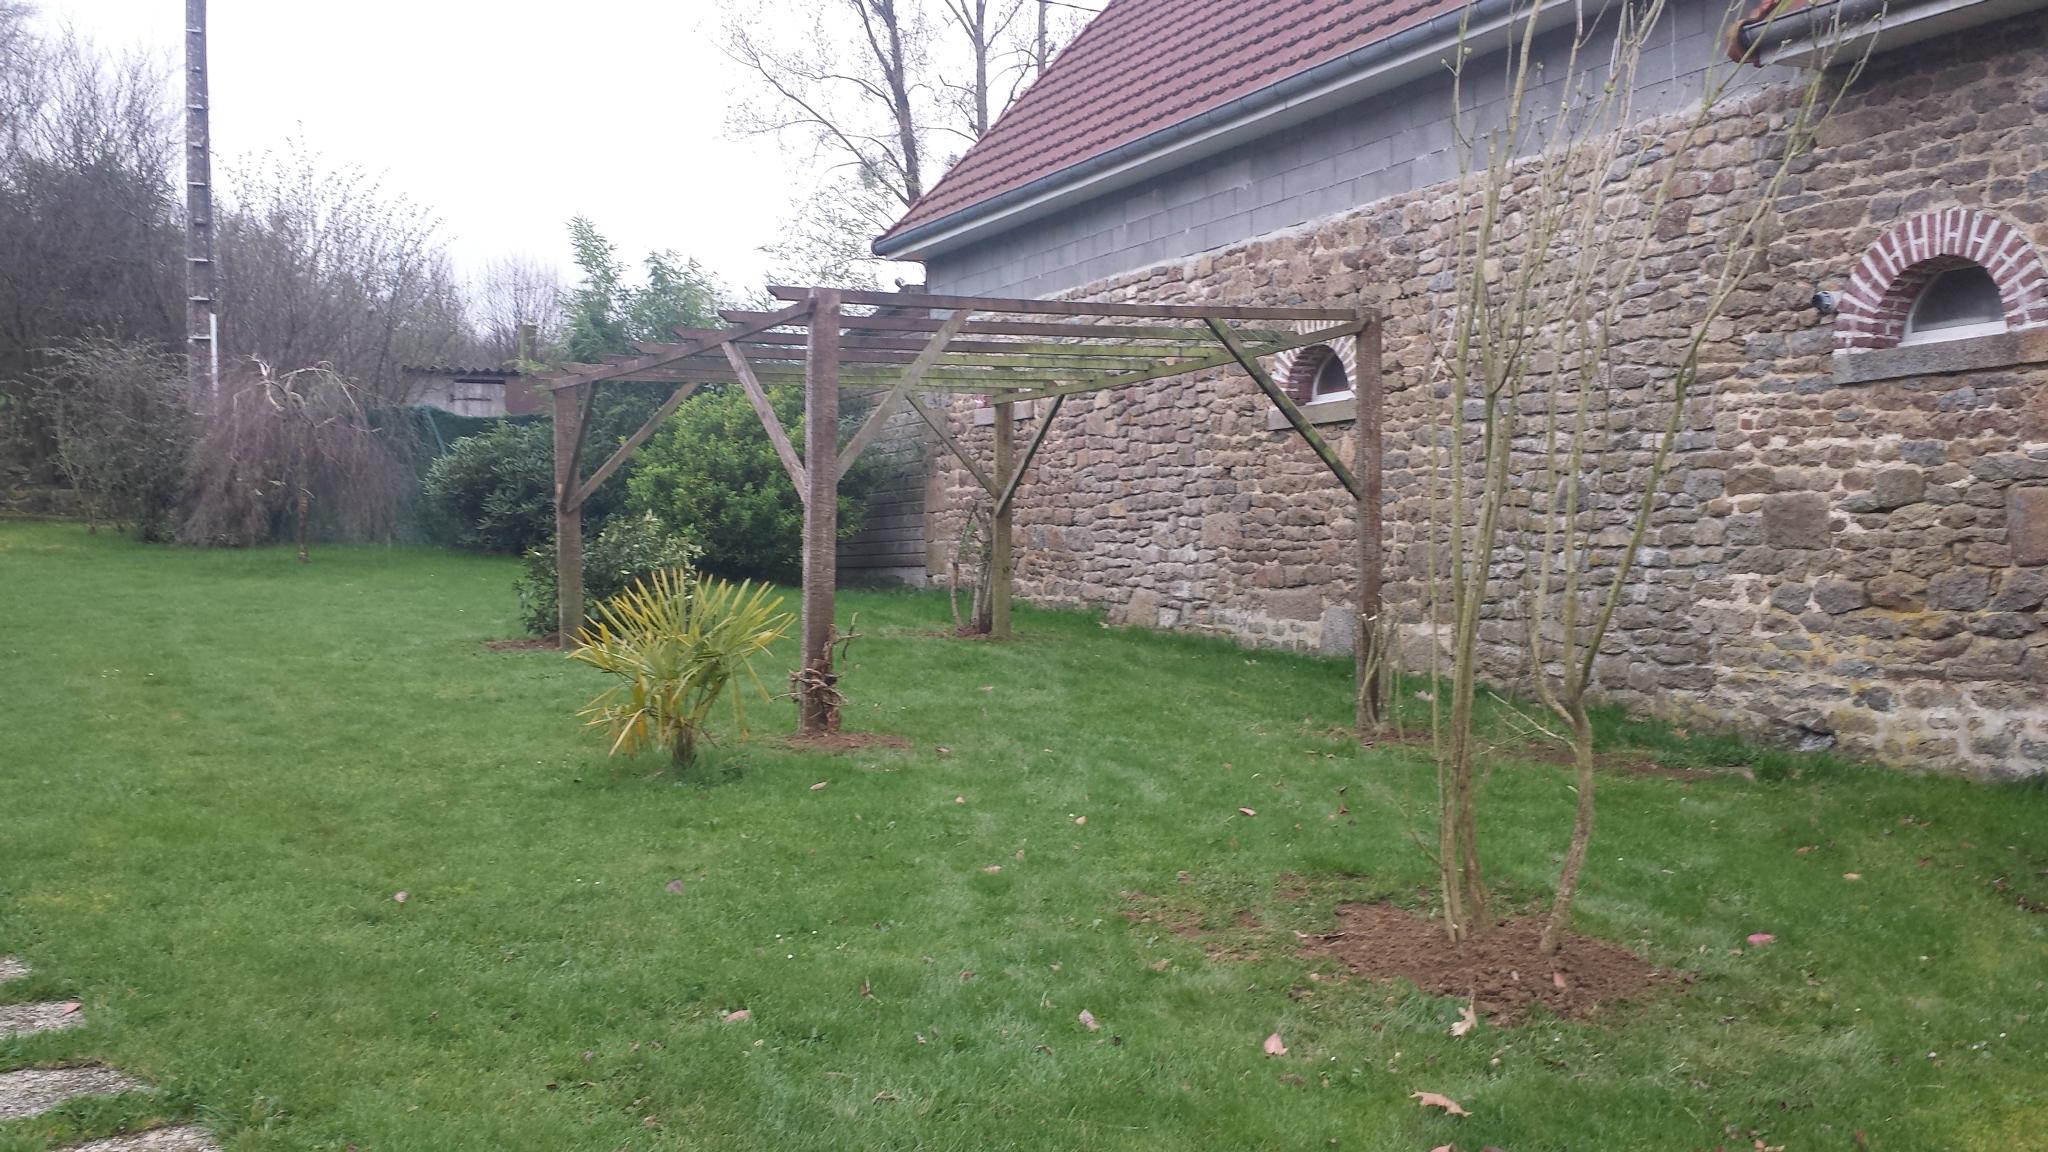 Installer bassin jardin fashion designs - Installer un poulailler dans son jardin ...